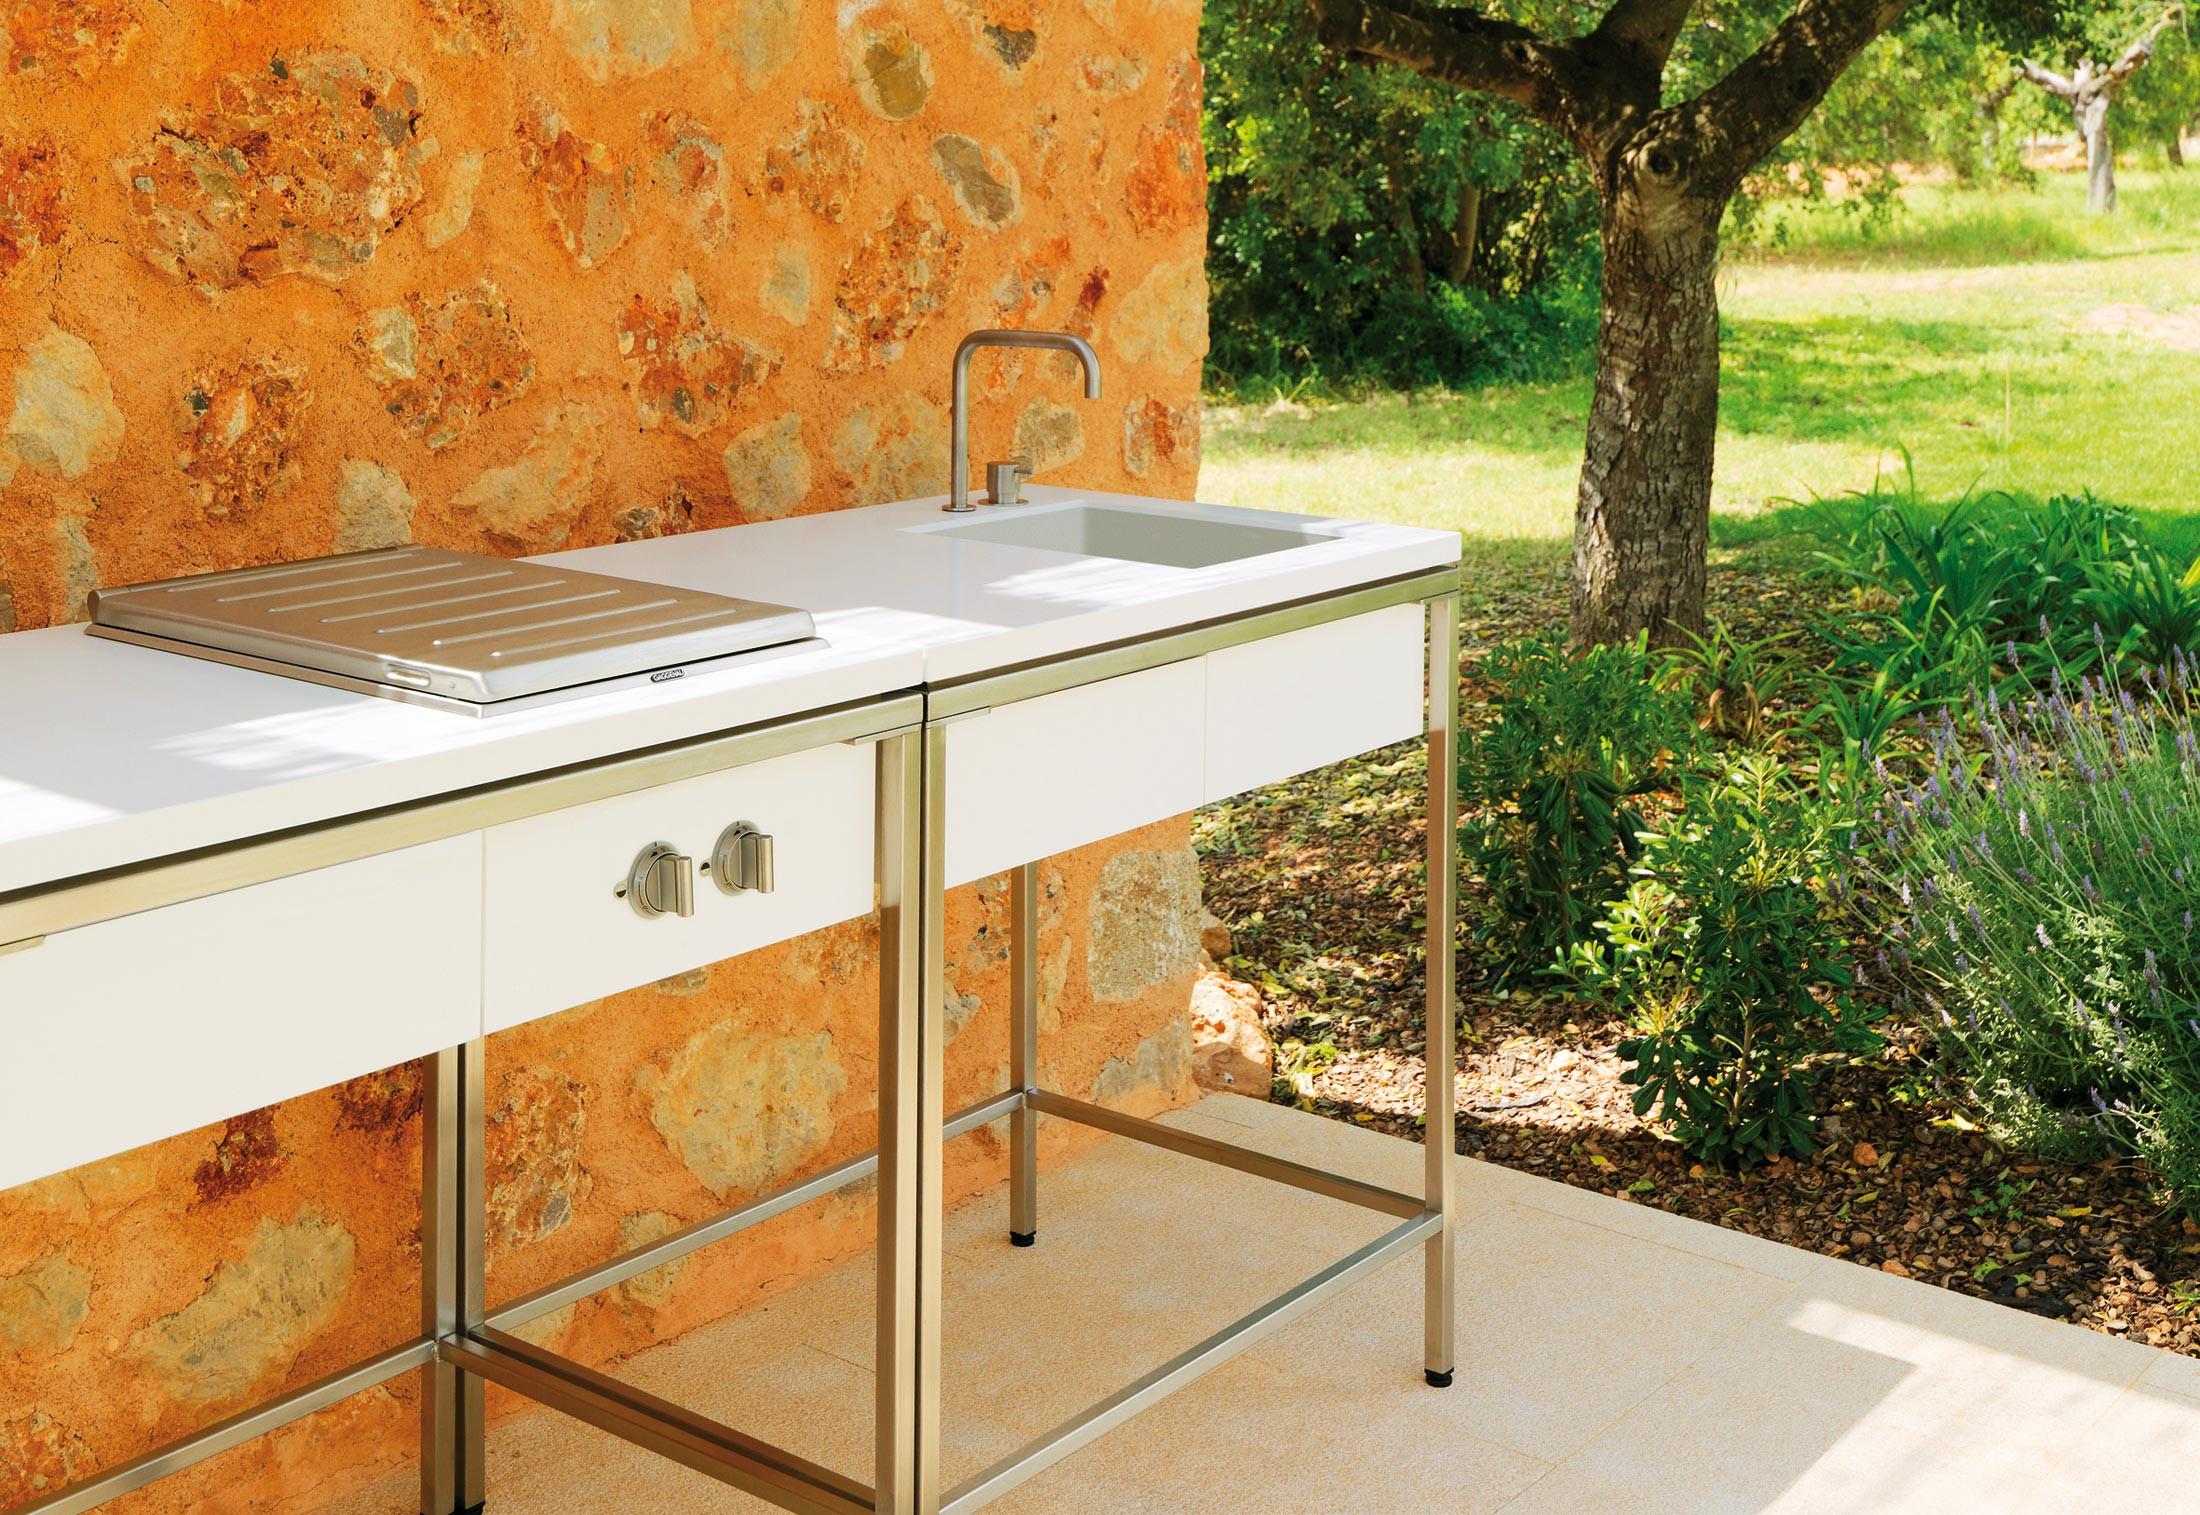 Outdoor Kitchen Sink  Outdoor Kitchen sink modul by VITEO